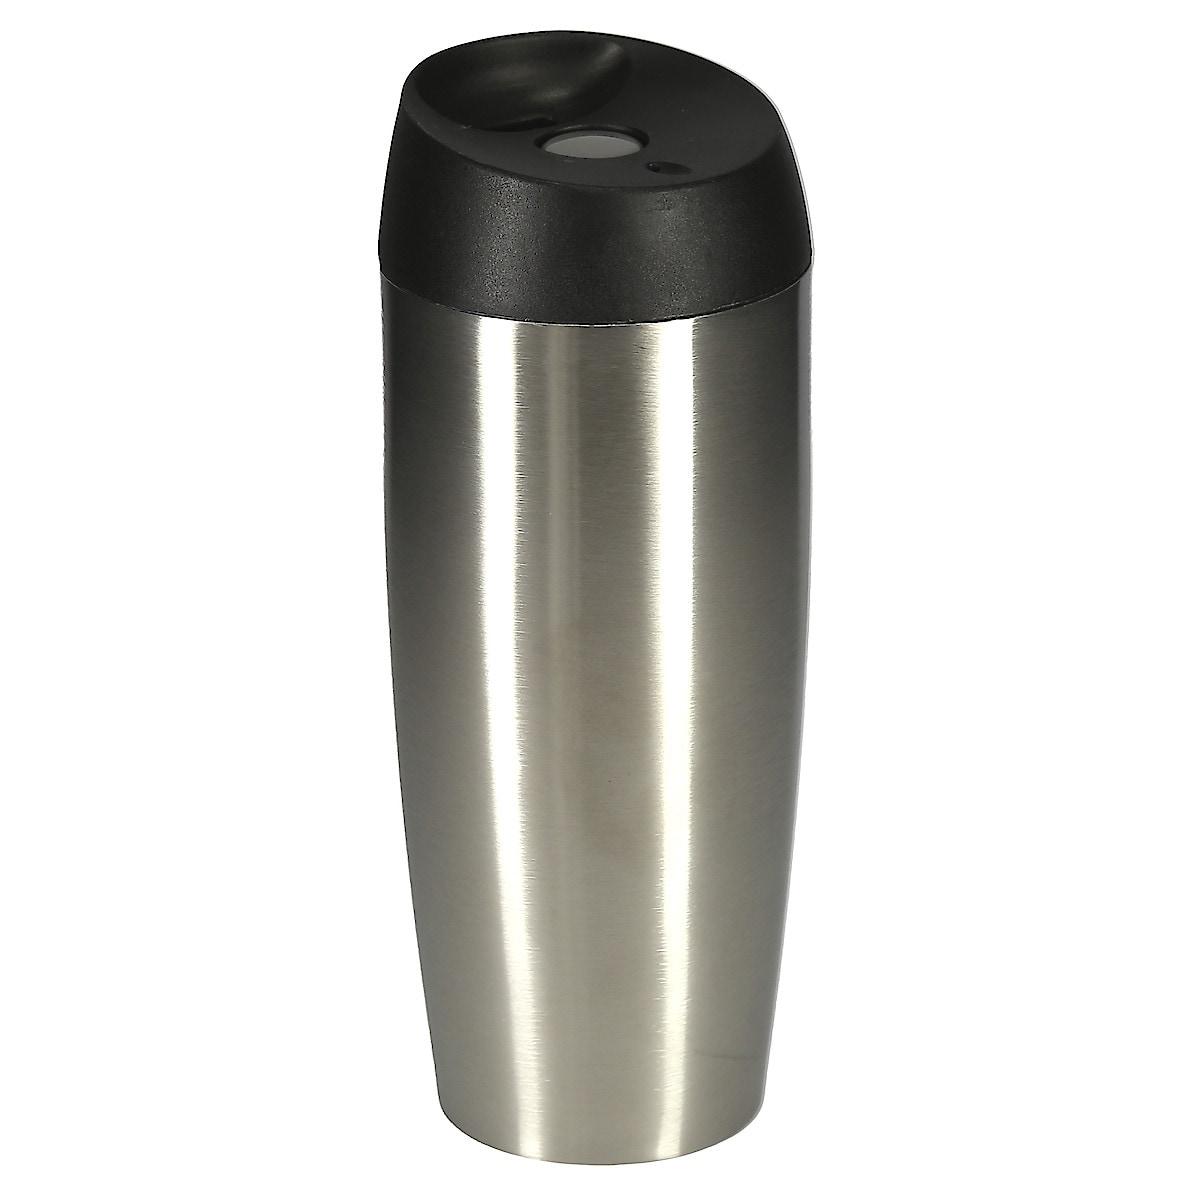 Kaffebryggare 2 Go